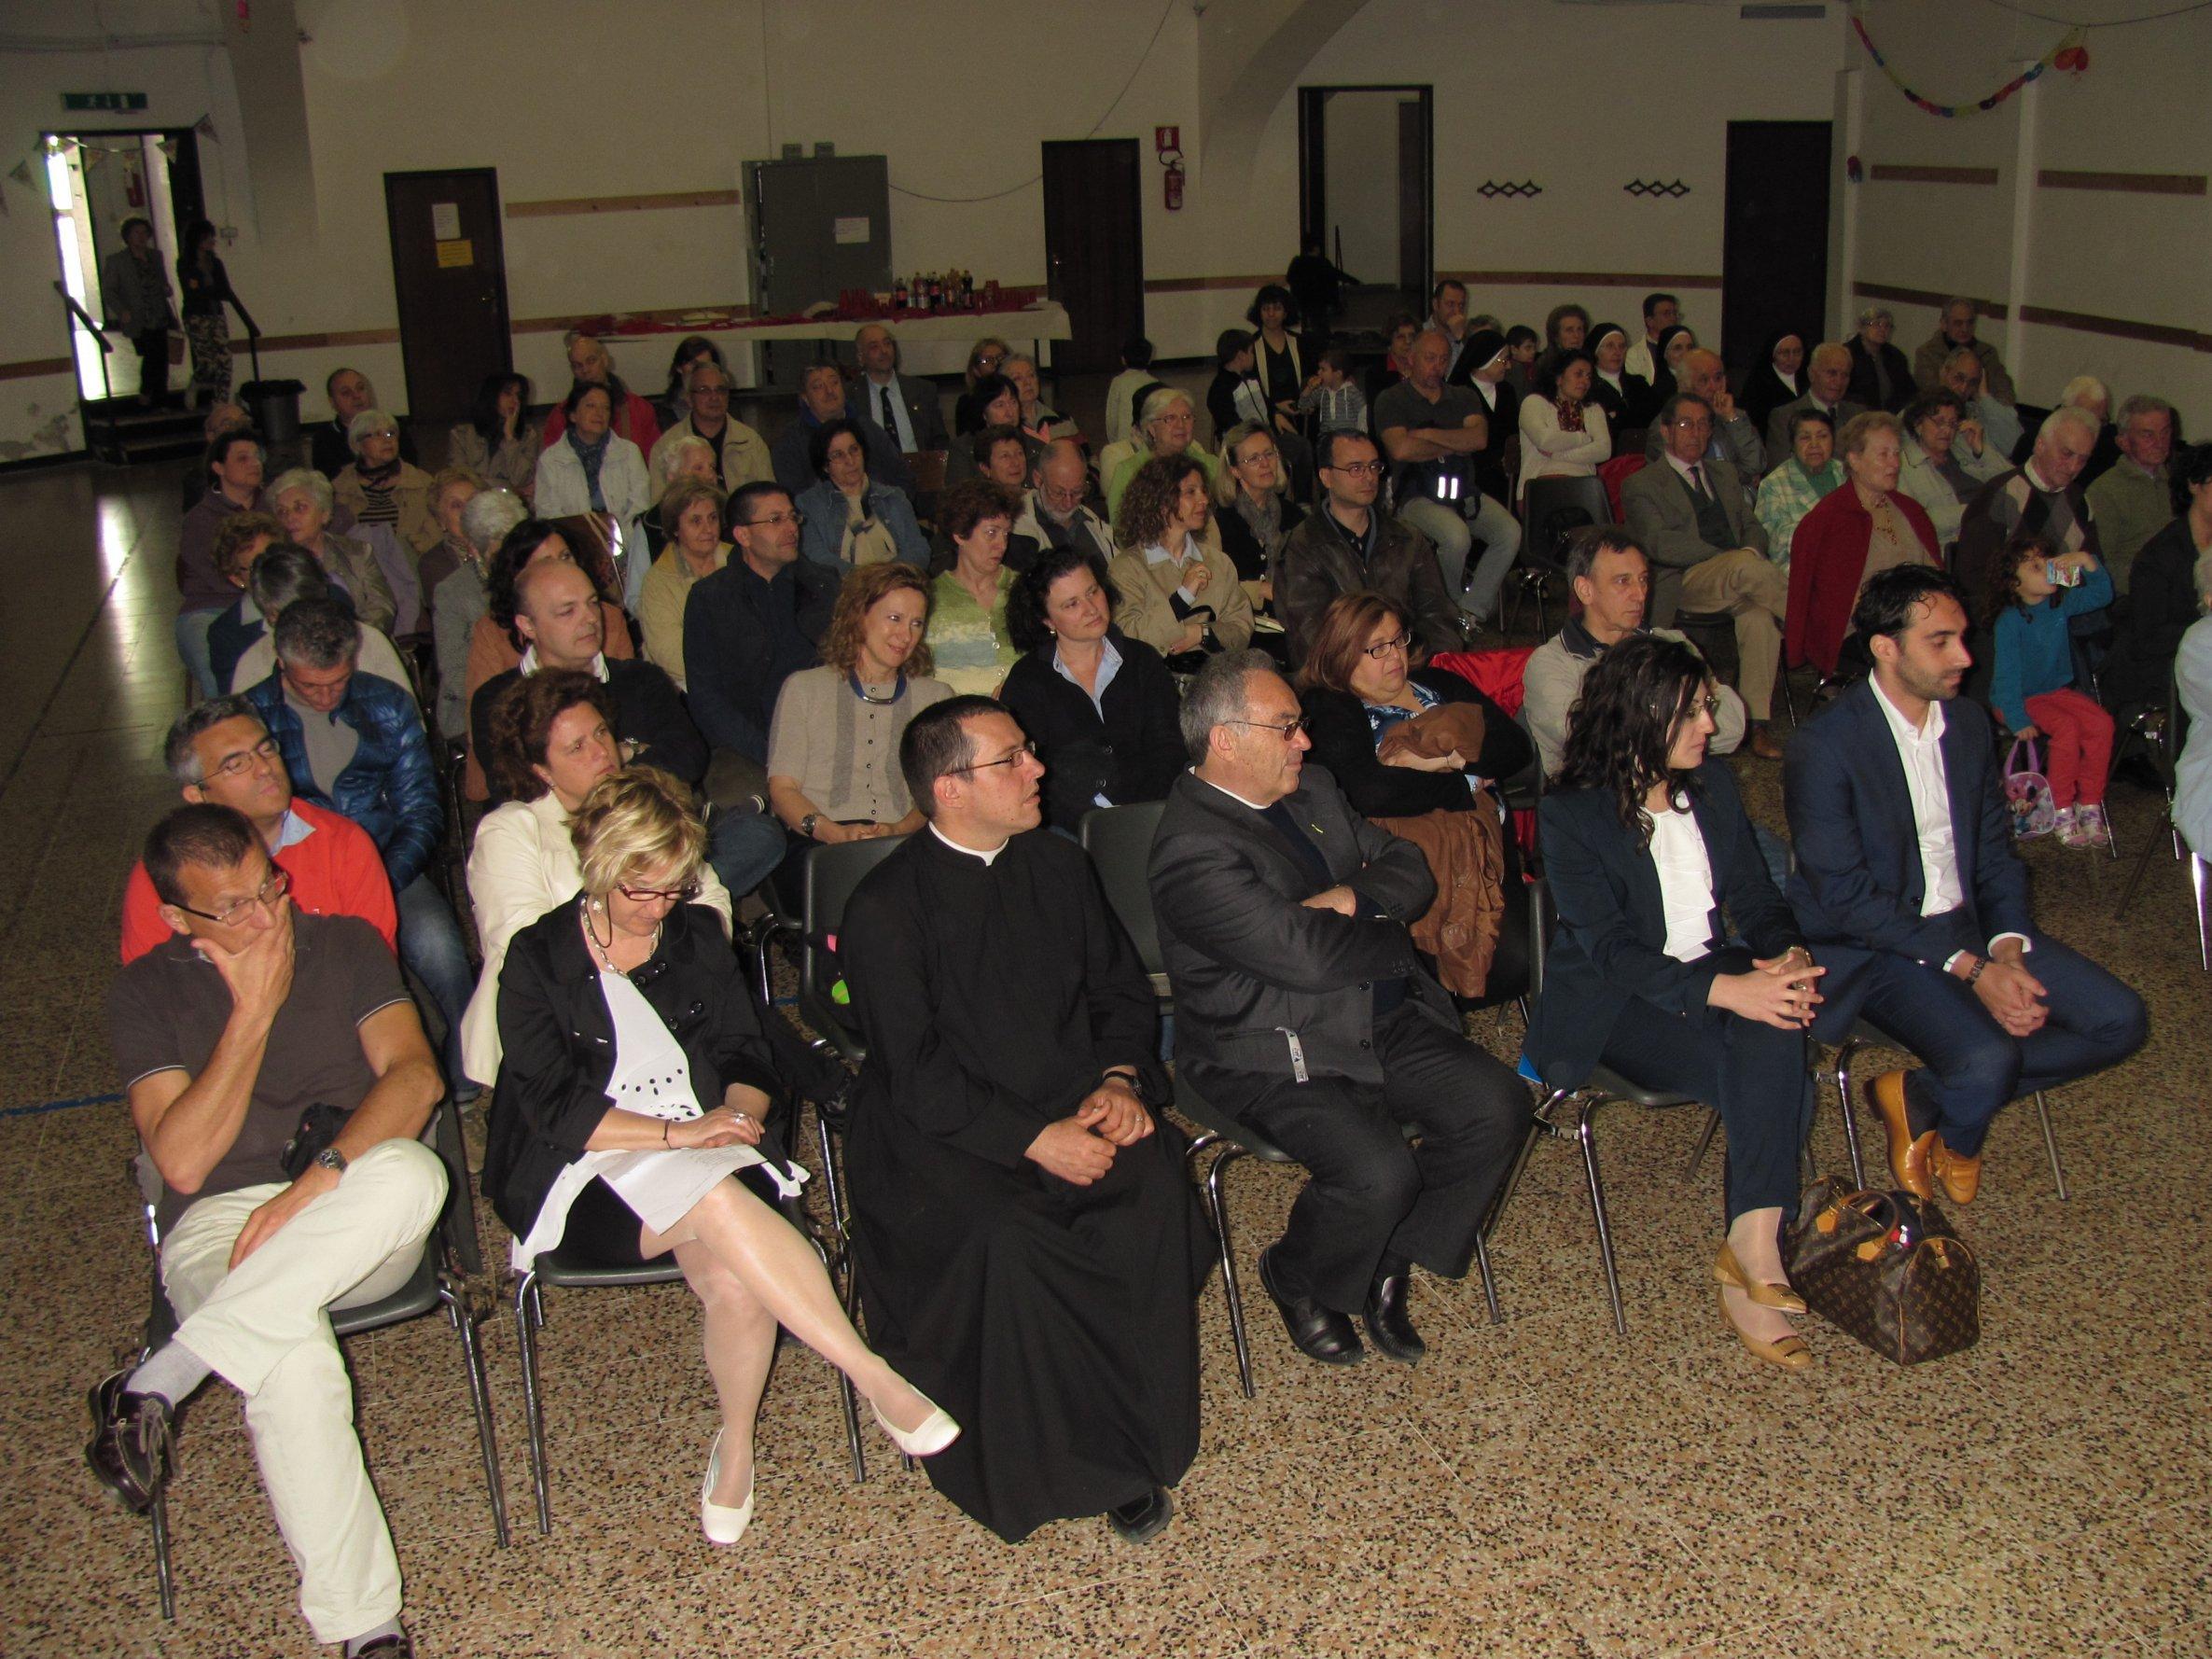 bagnasco_e_famiglie_vicariato_2013-05-26-14-45-08